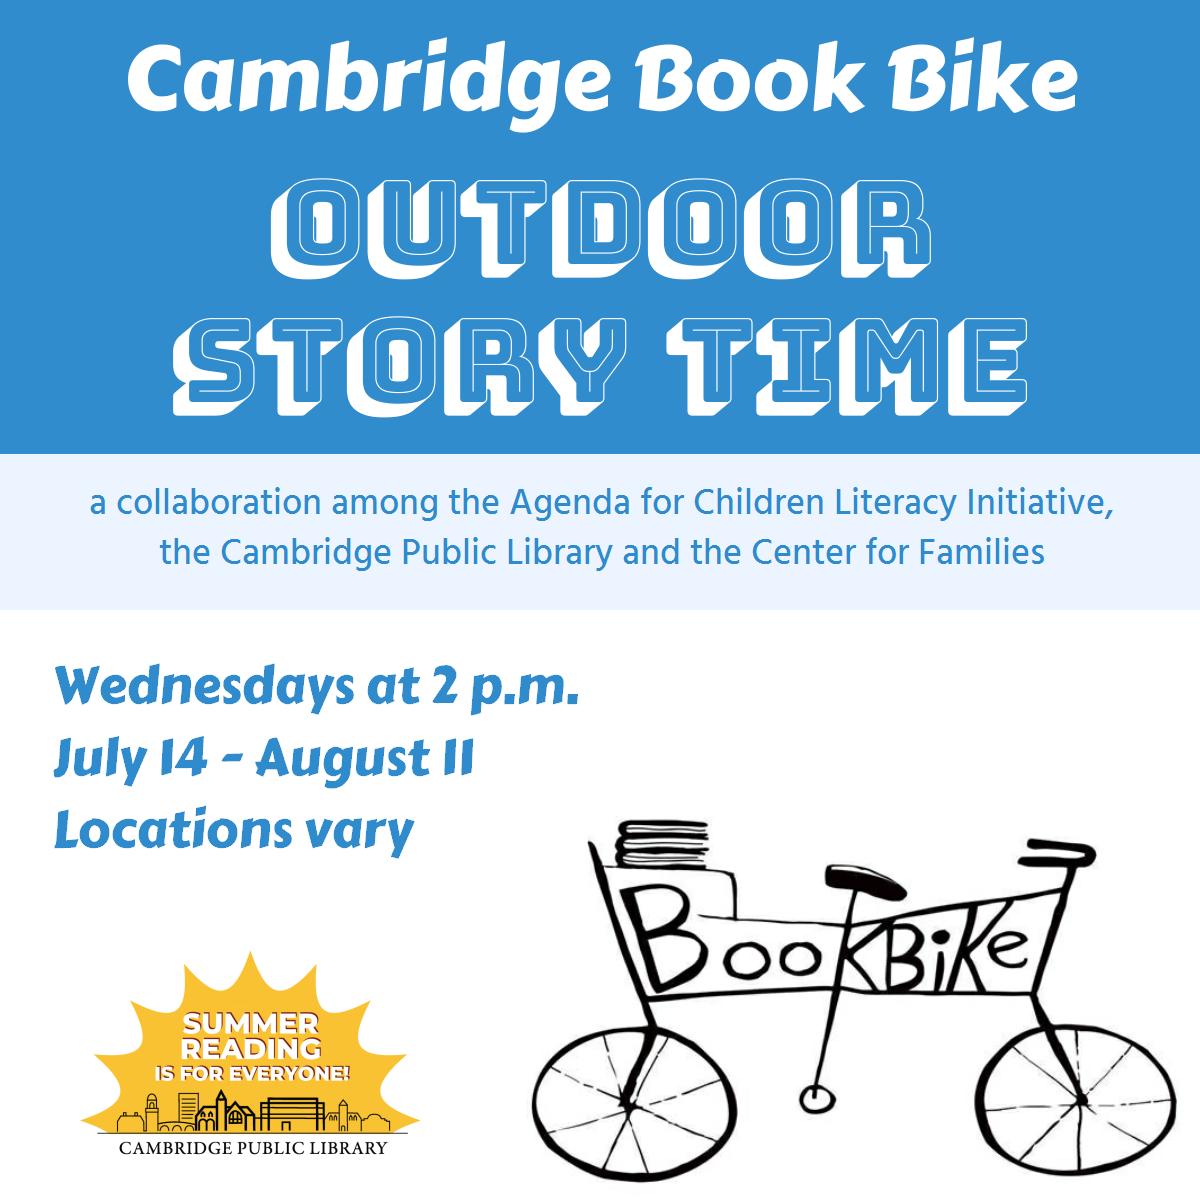 Cambridge Book Bike Story Time (Valente)